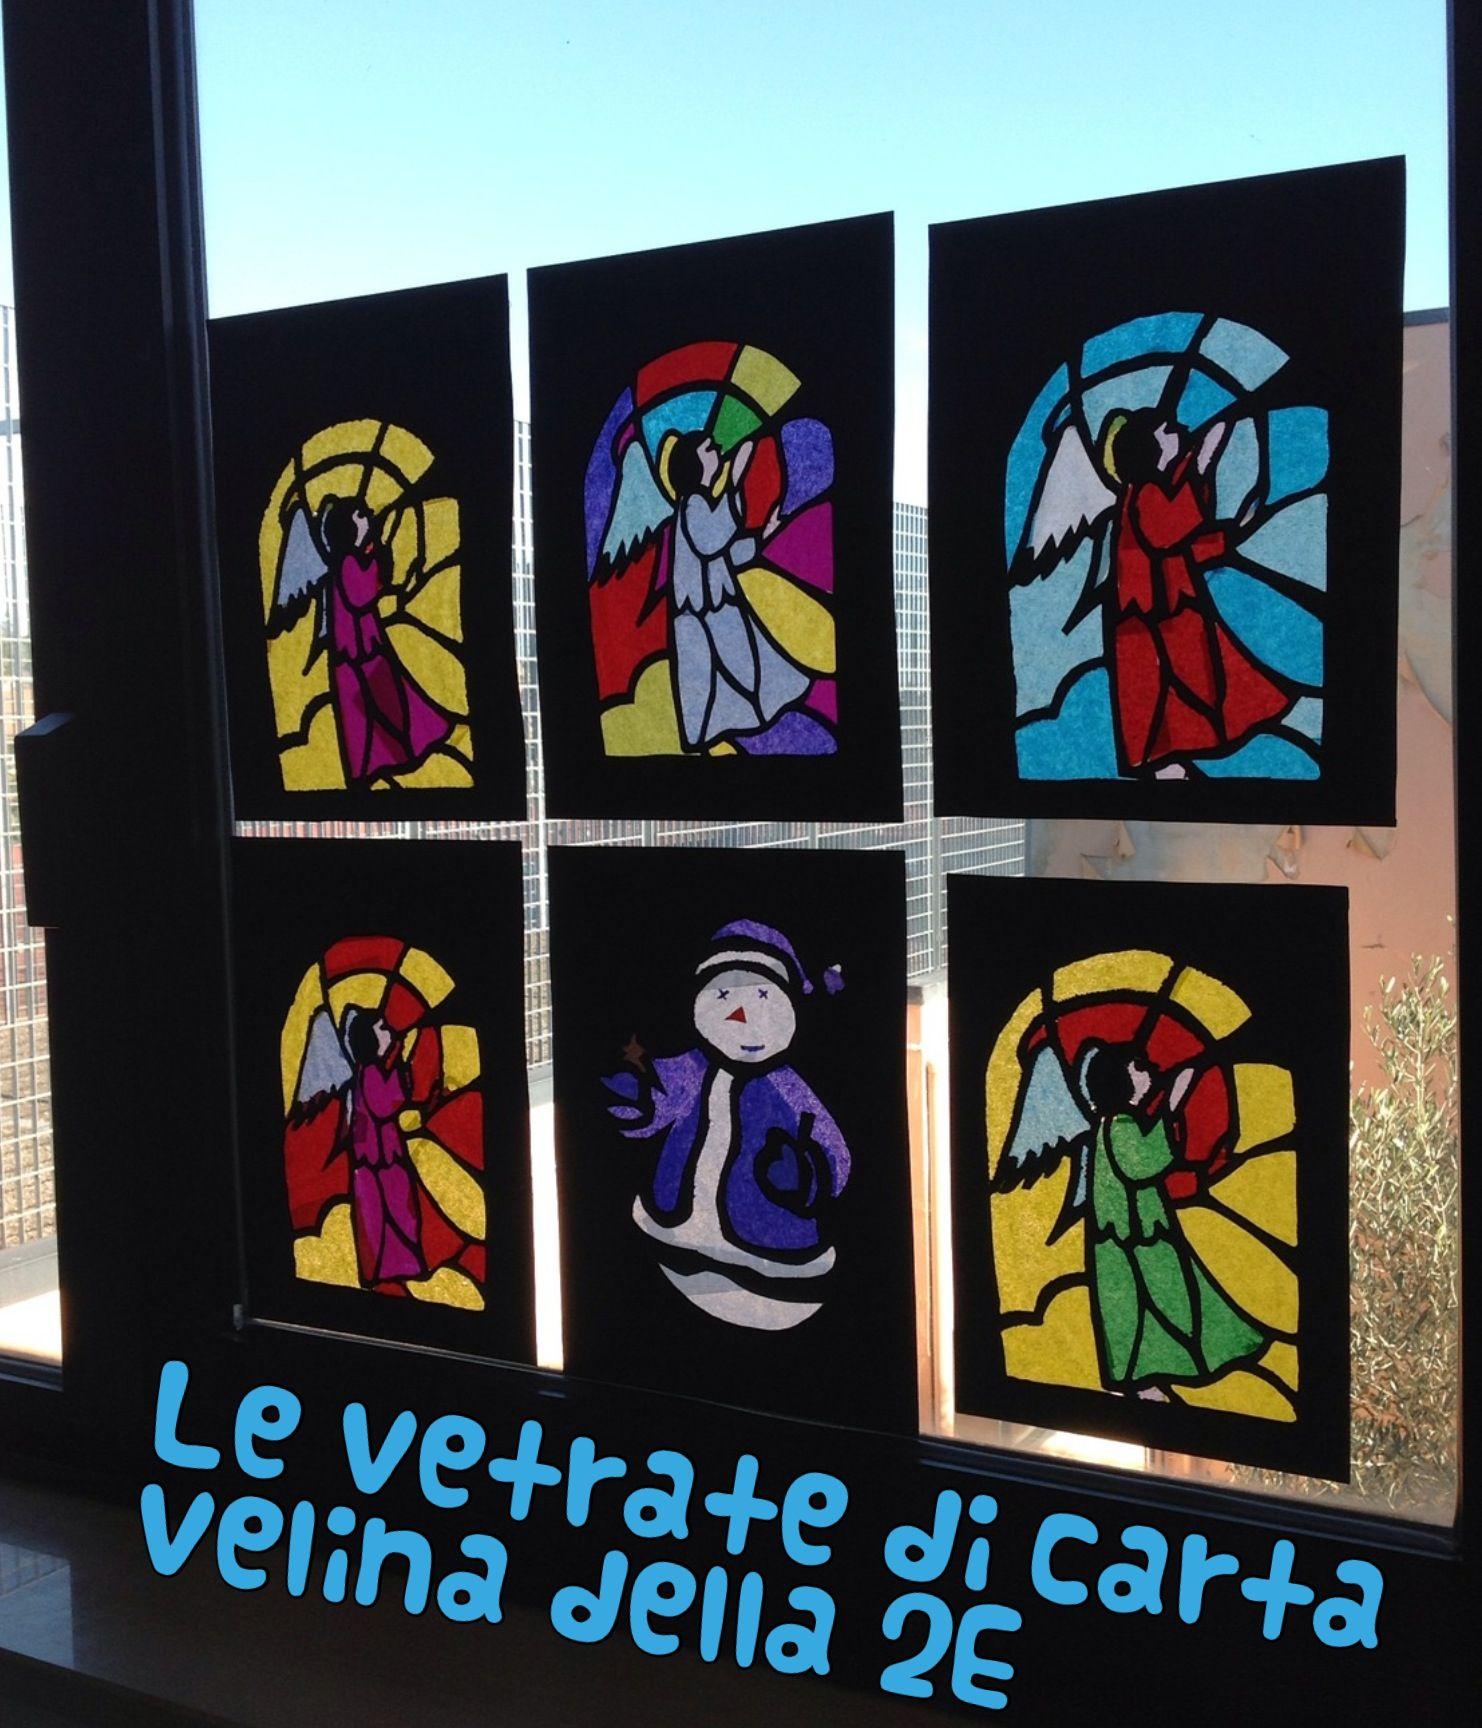 Vetrate Con Carta Velina.Le Vetrate Di Carta Velina Www Allegrarte Blogspot Com Art